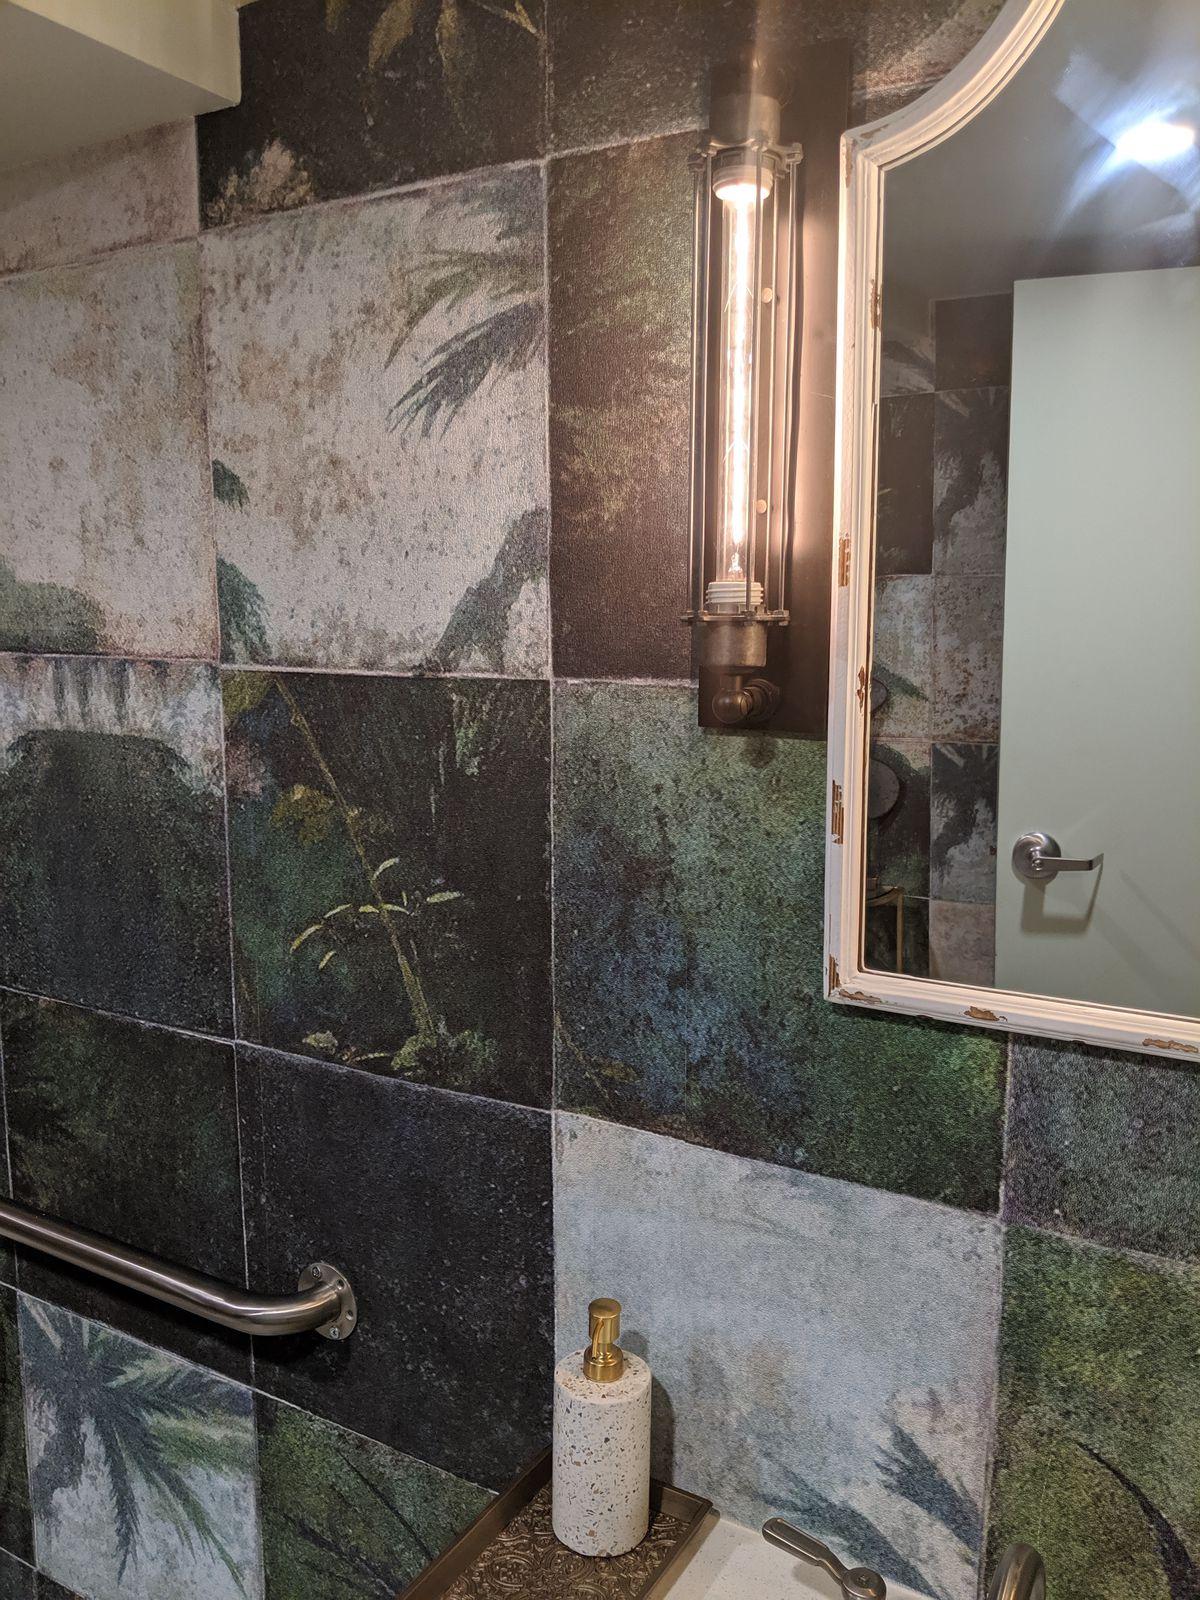 Bathrooms feel like Club Med at Residents